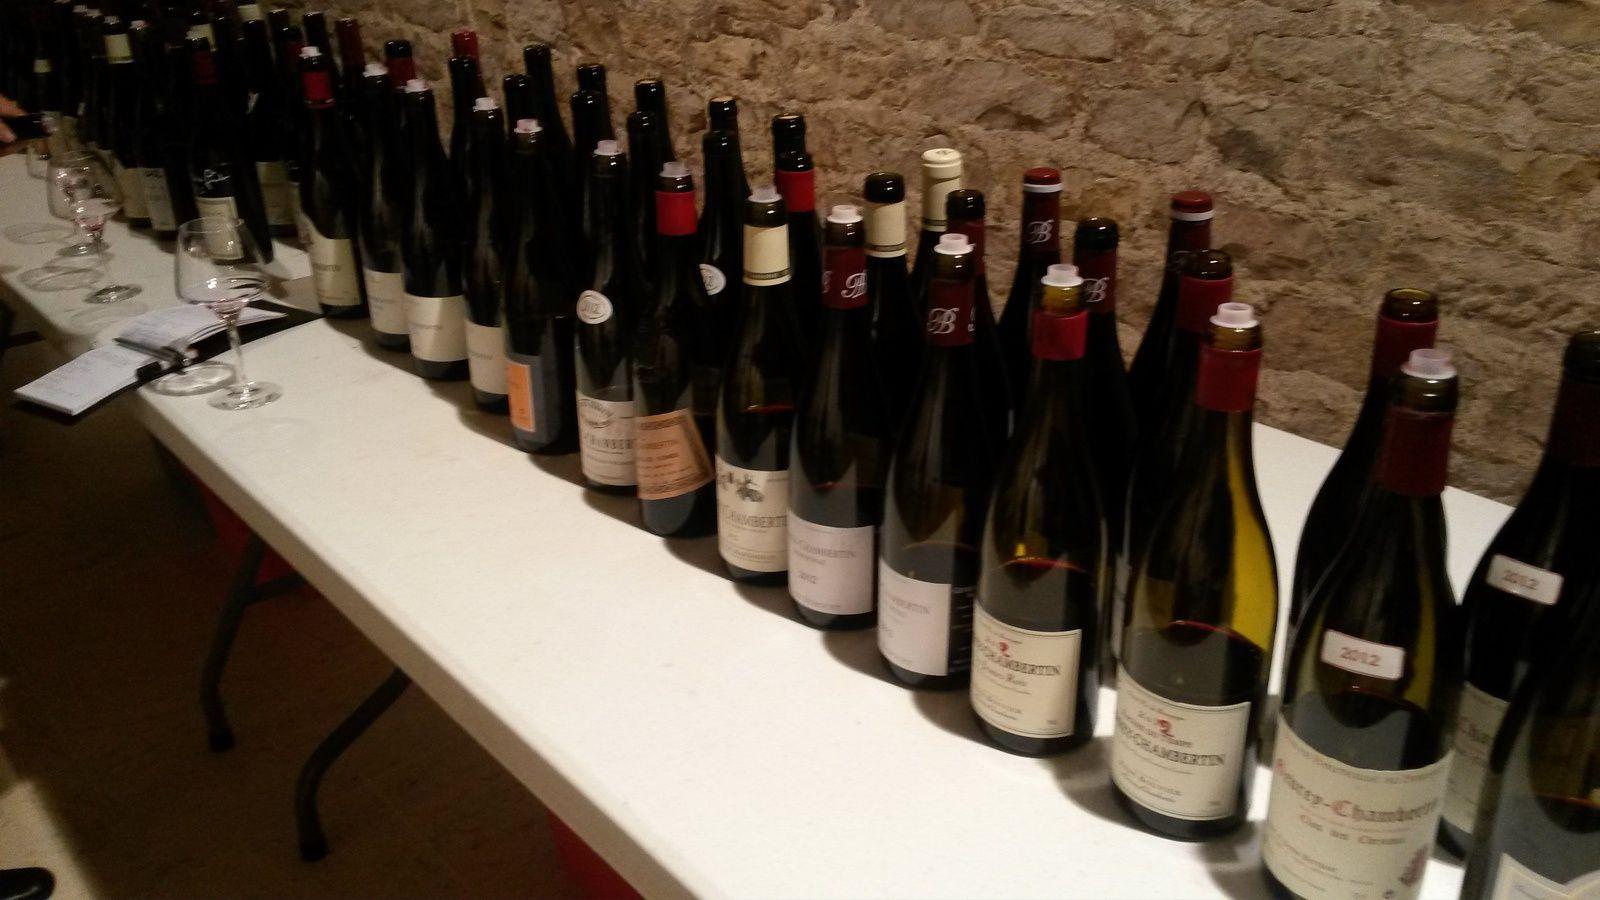 La dégustation des vins de Gevrey Chambertin 2012